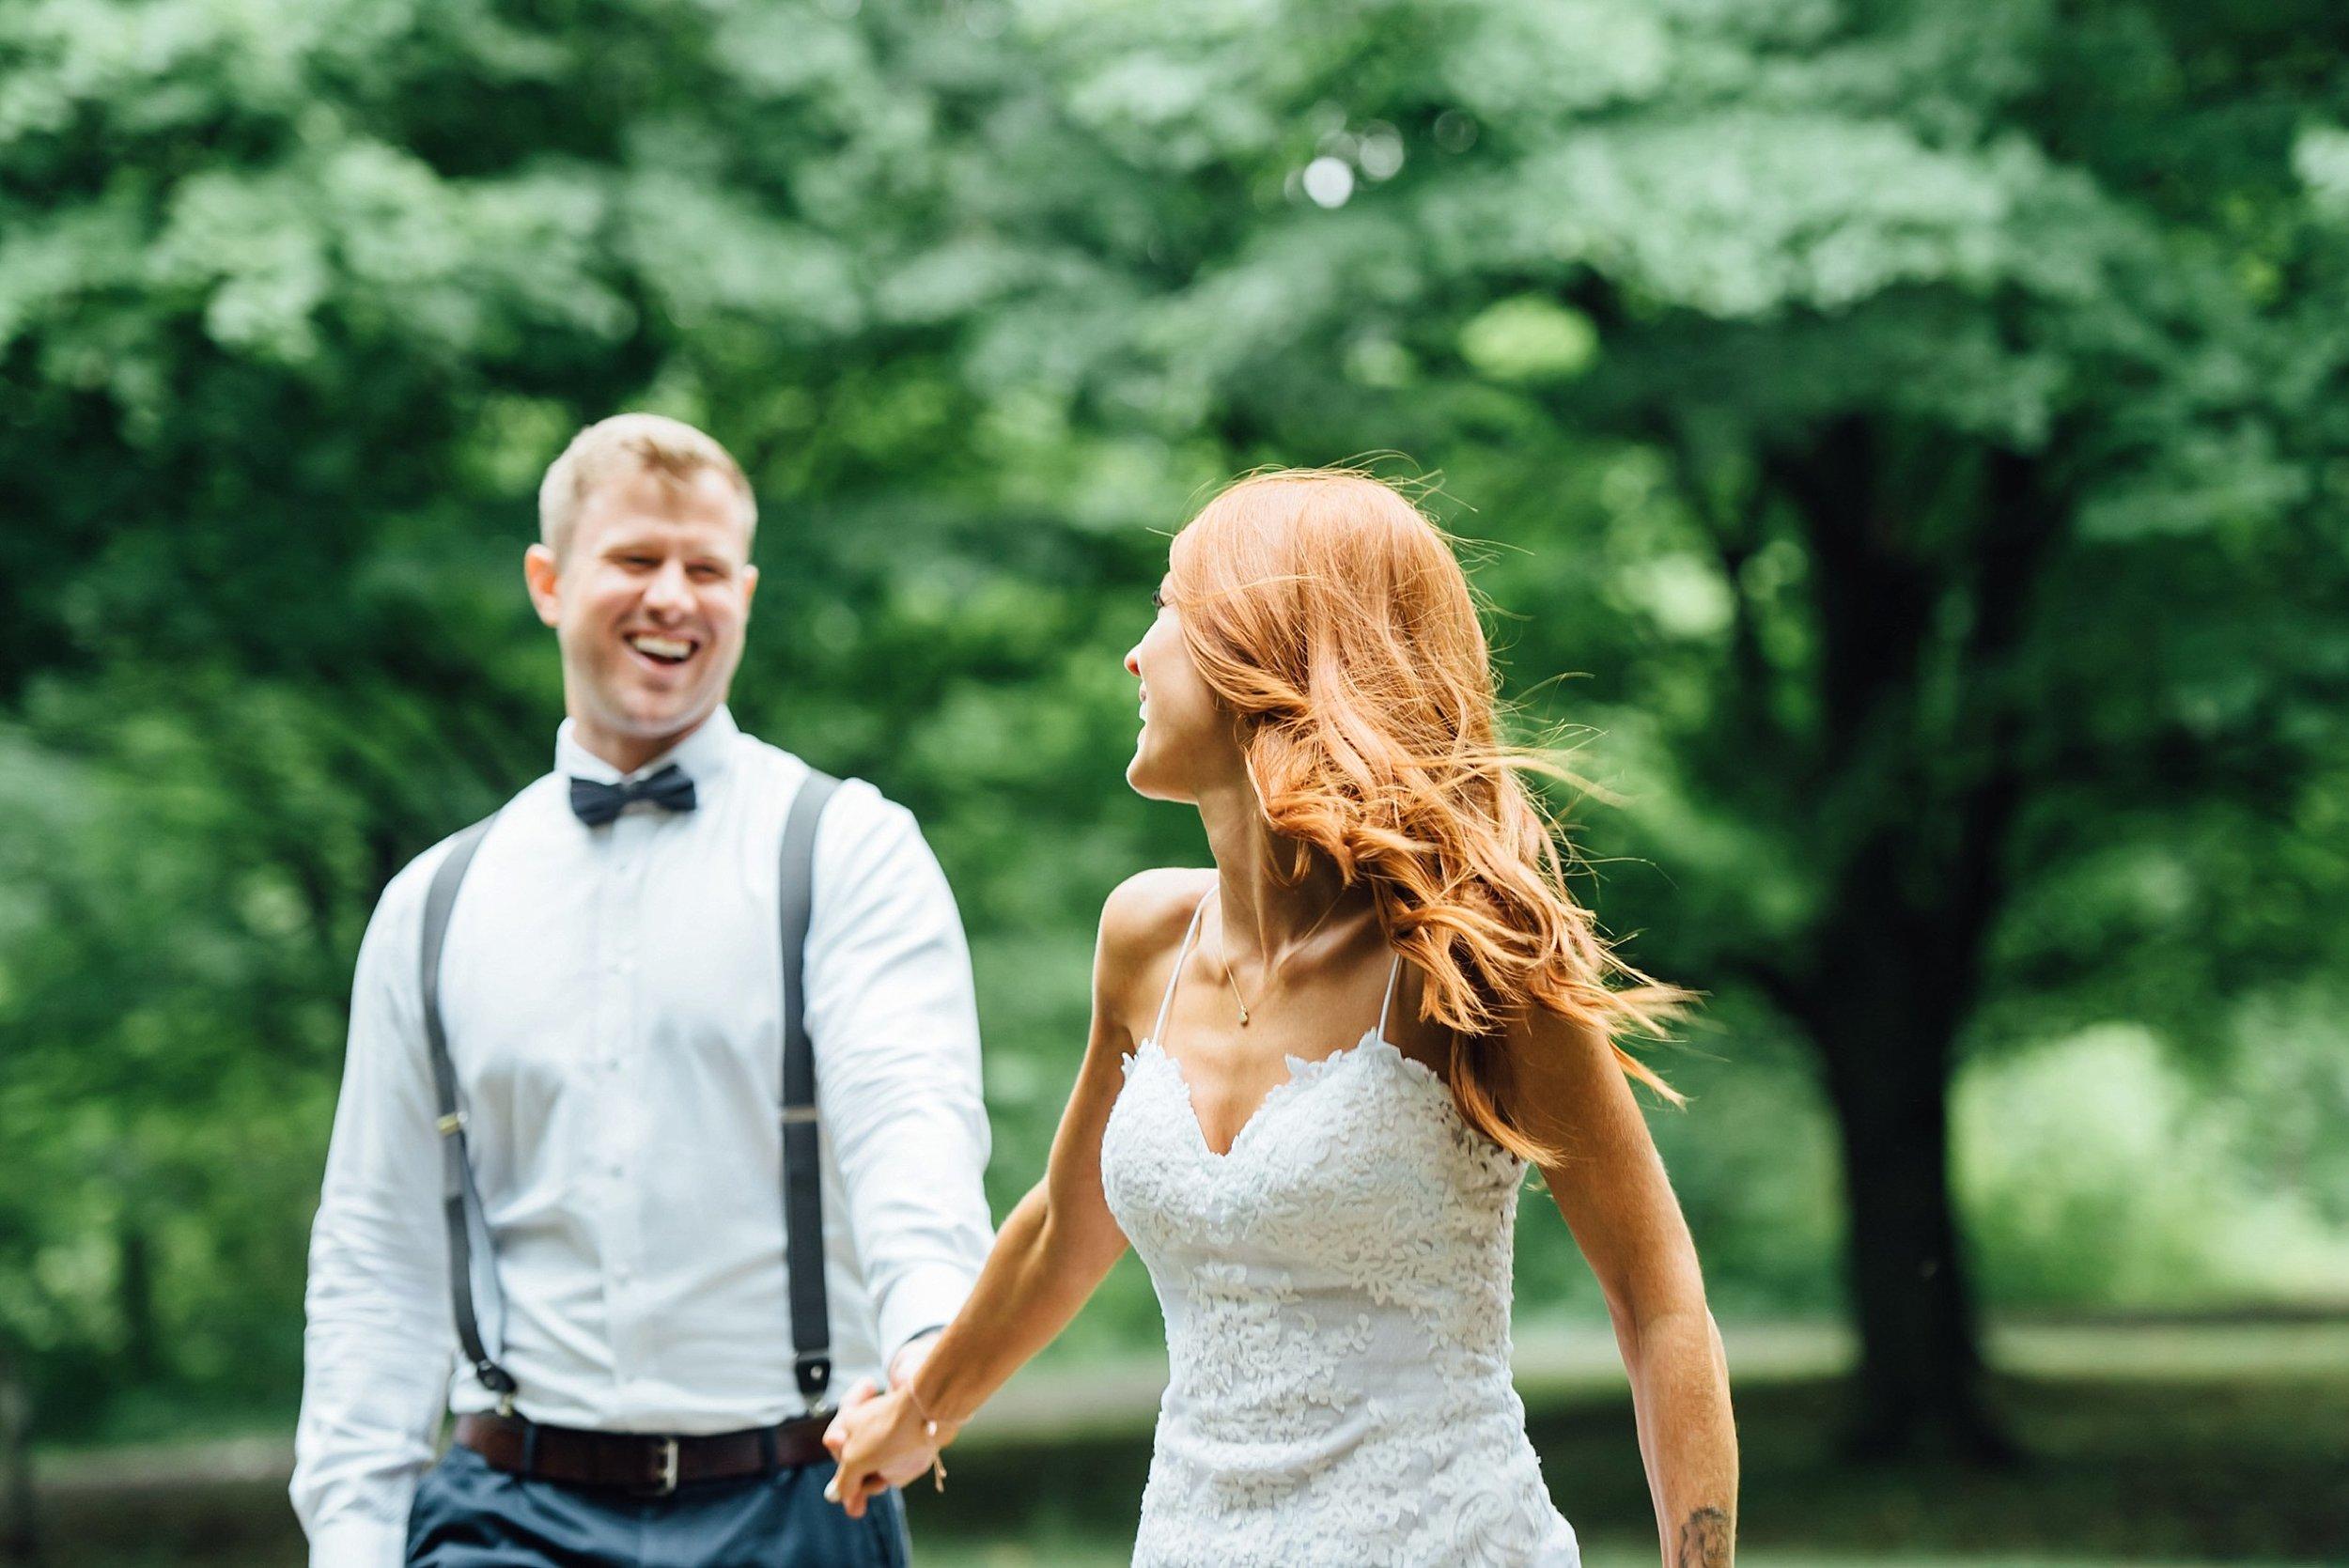 Ottawa Wedding Photographer - Stanley's Olde Maple Lane Barn Wedding - Ali & Batoul Photography_0019.jpg